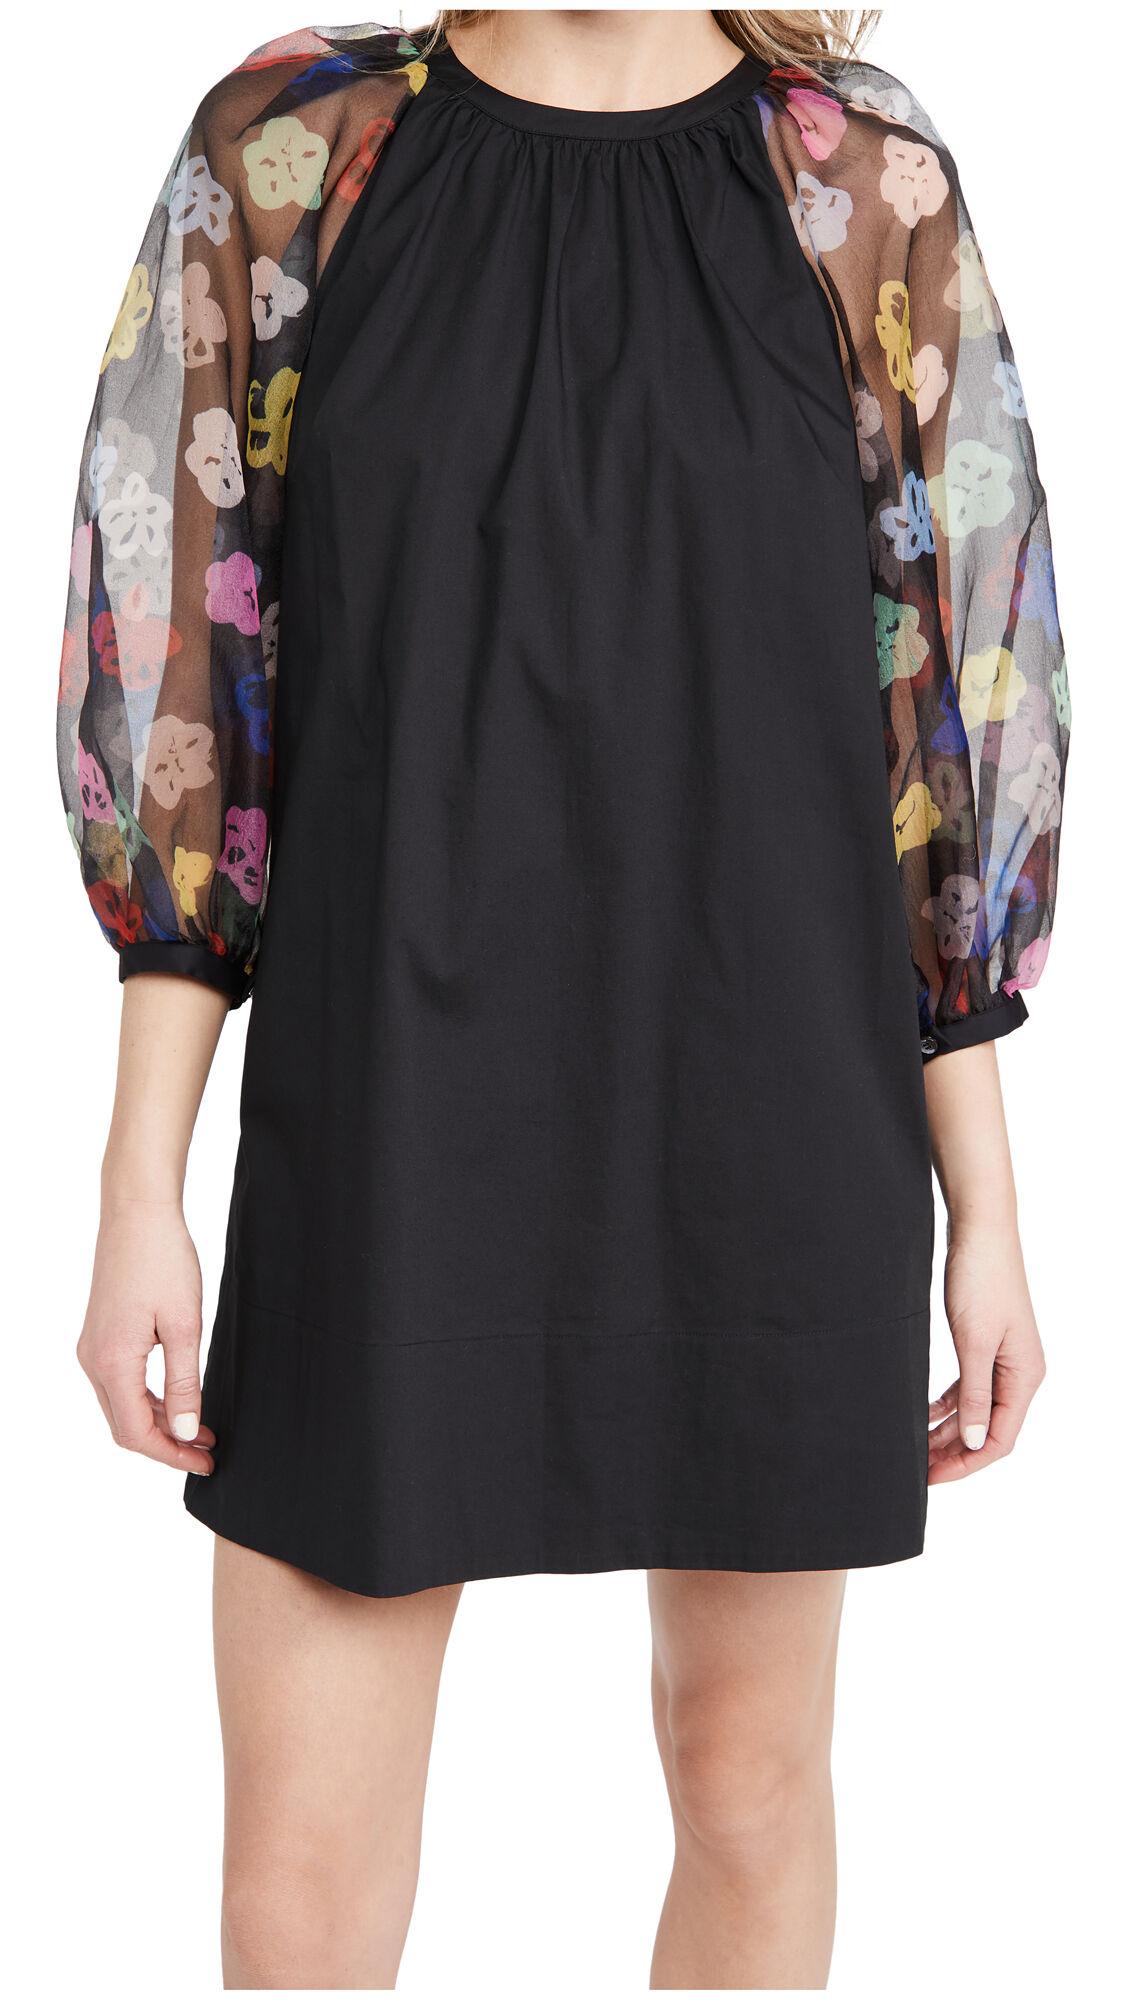 STAUD Garden Dress  - Rainbow Bloom Black - Size: Extra Small